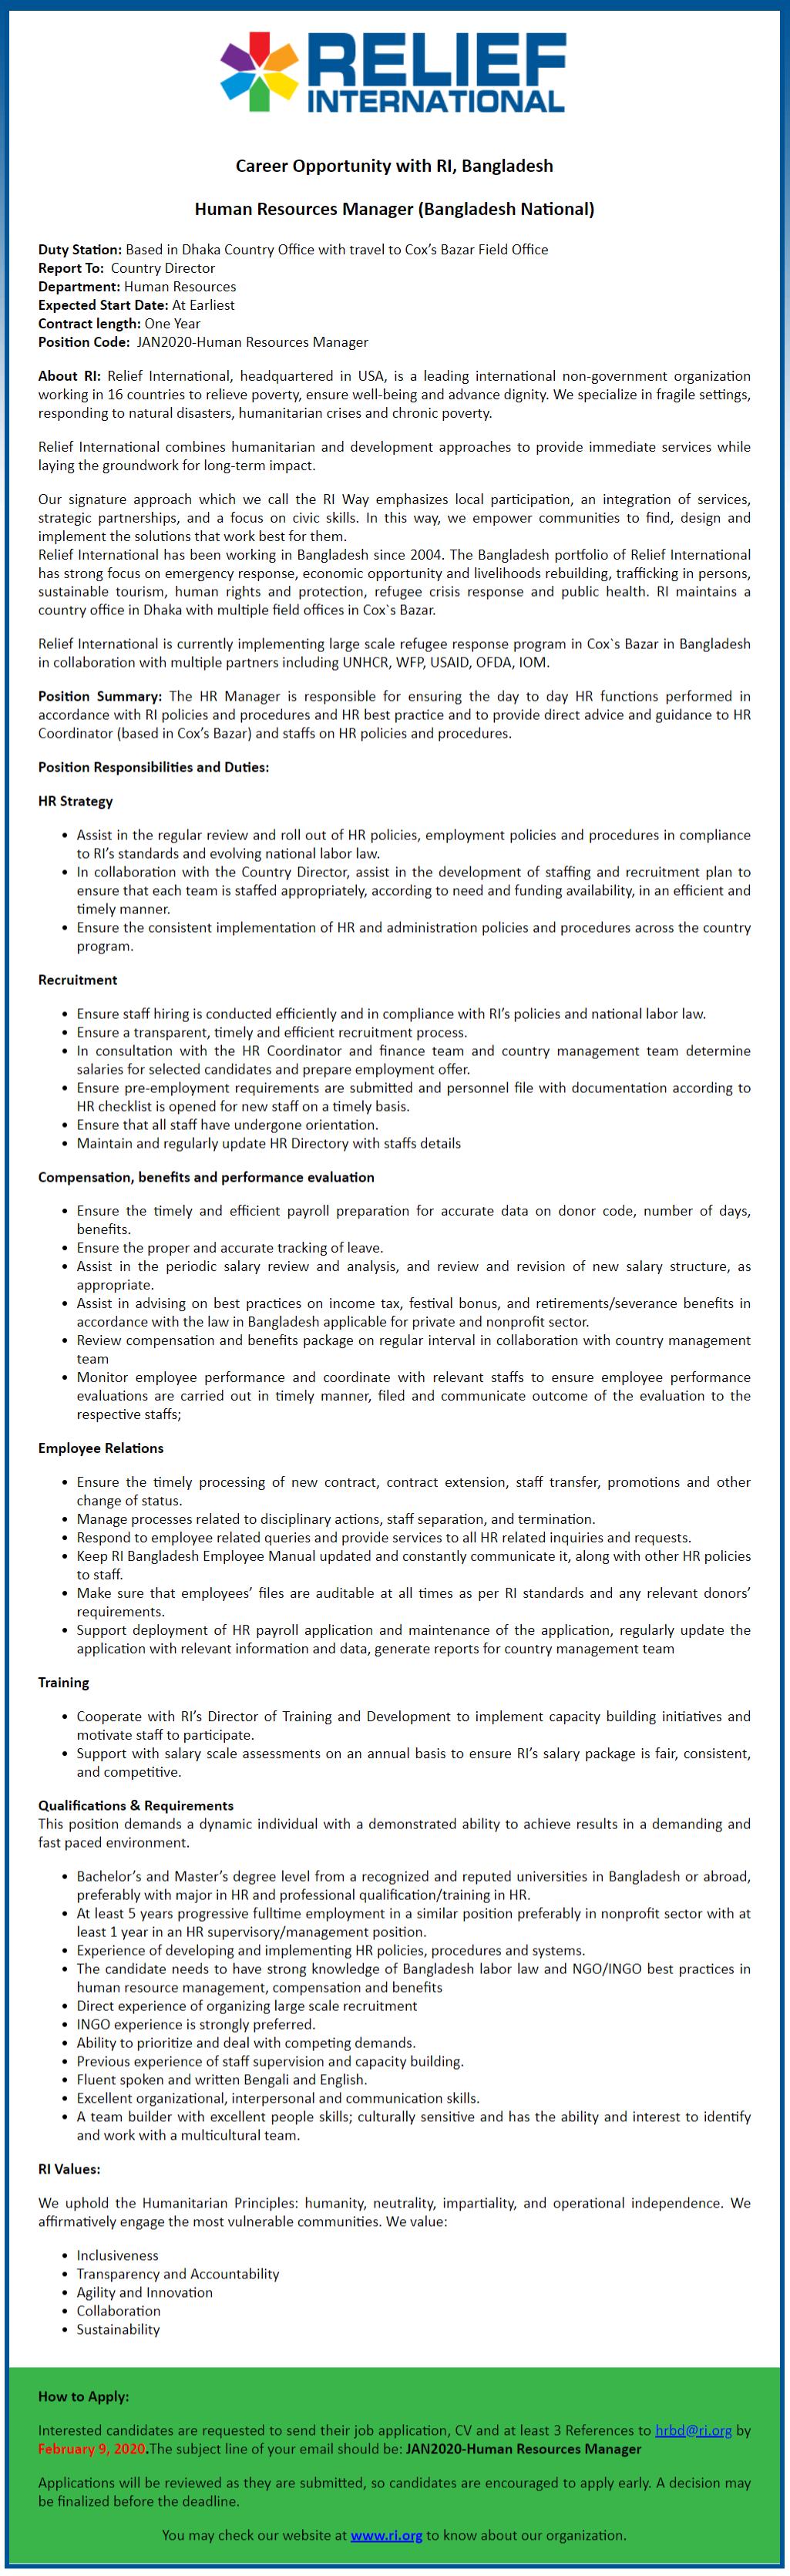 Relief International (RI) Job Circular 2020